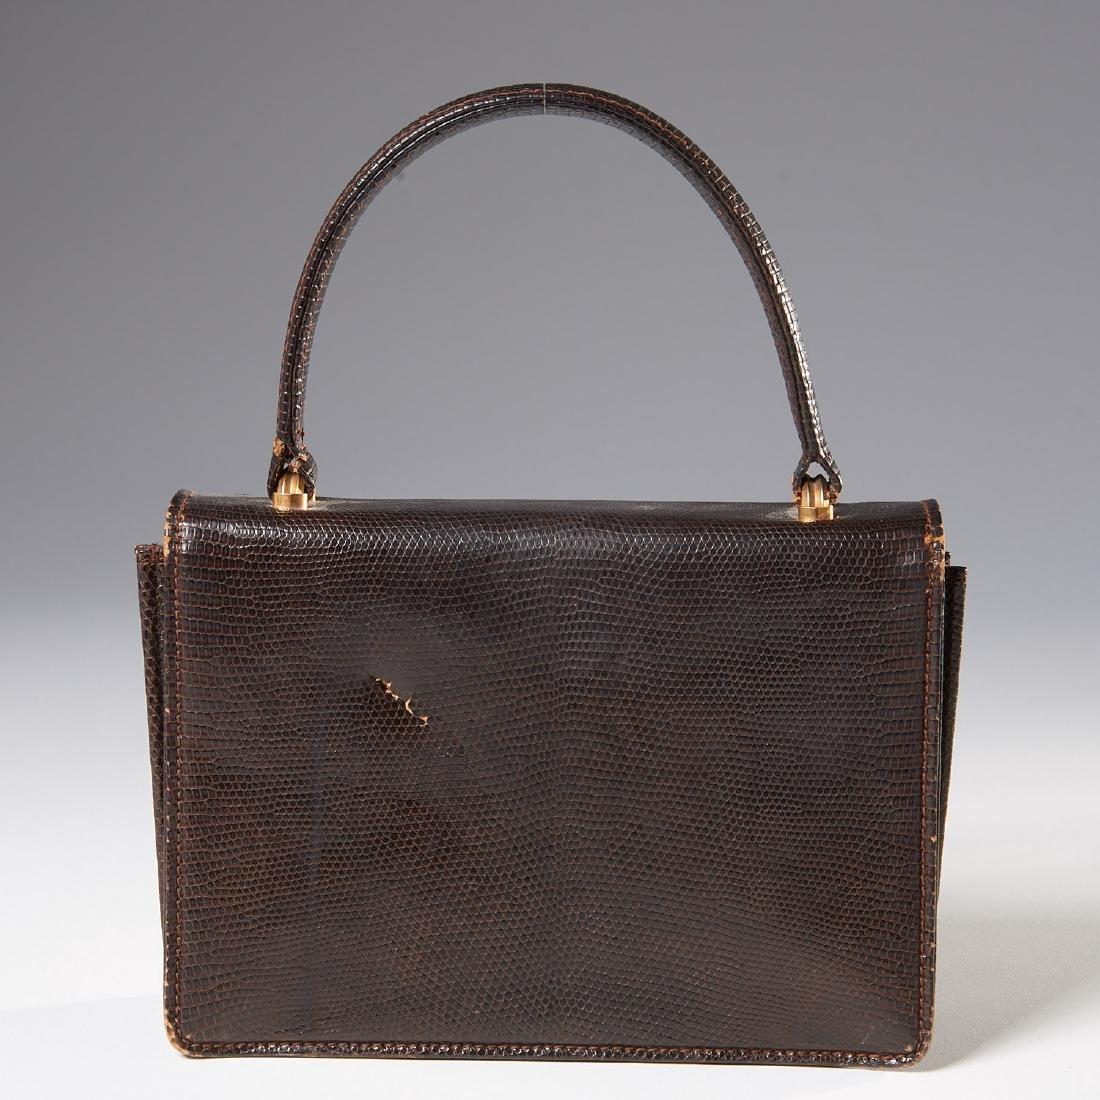 Gucci brown lizard handbag - 3